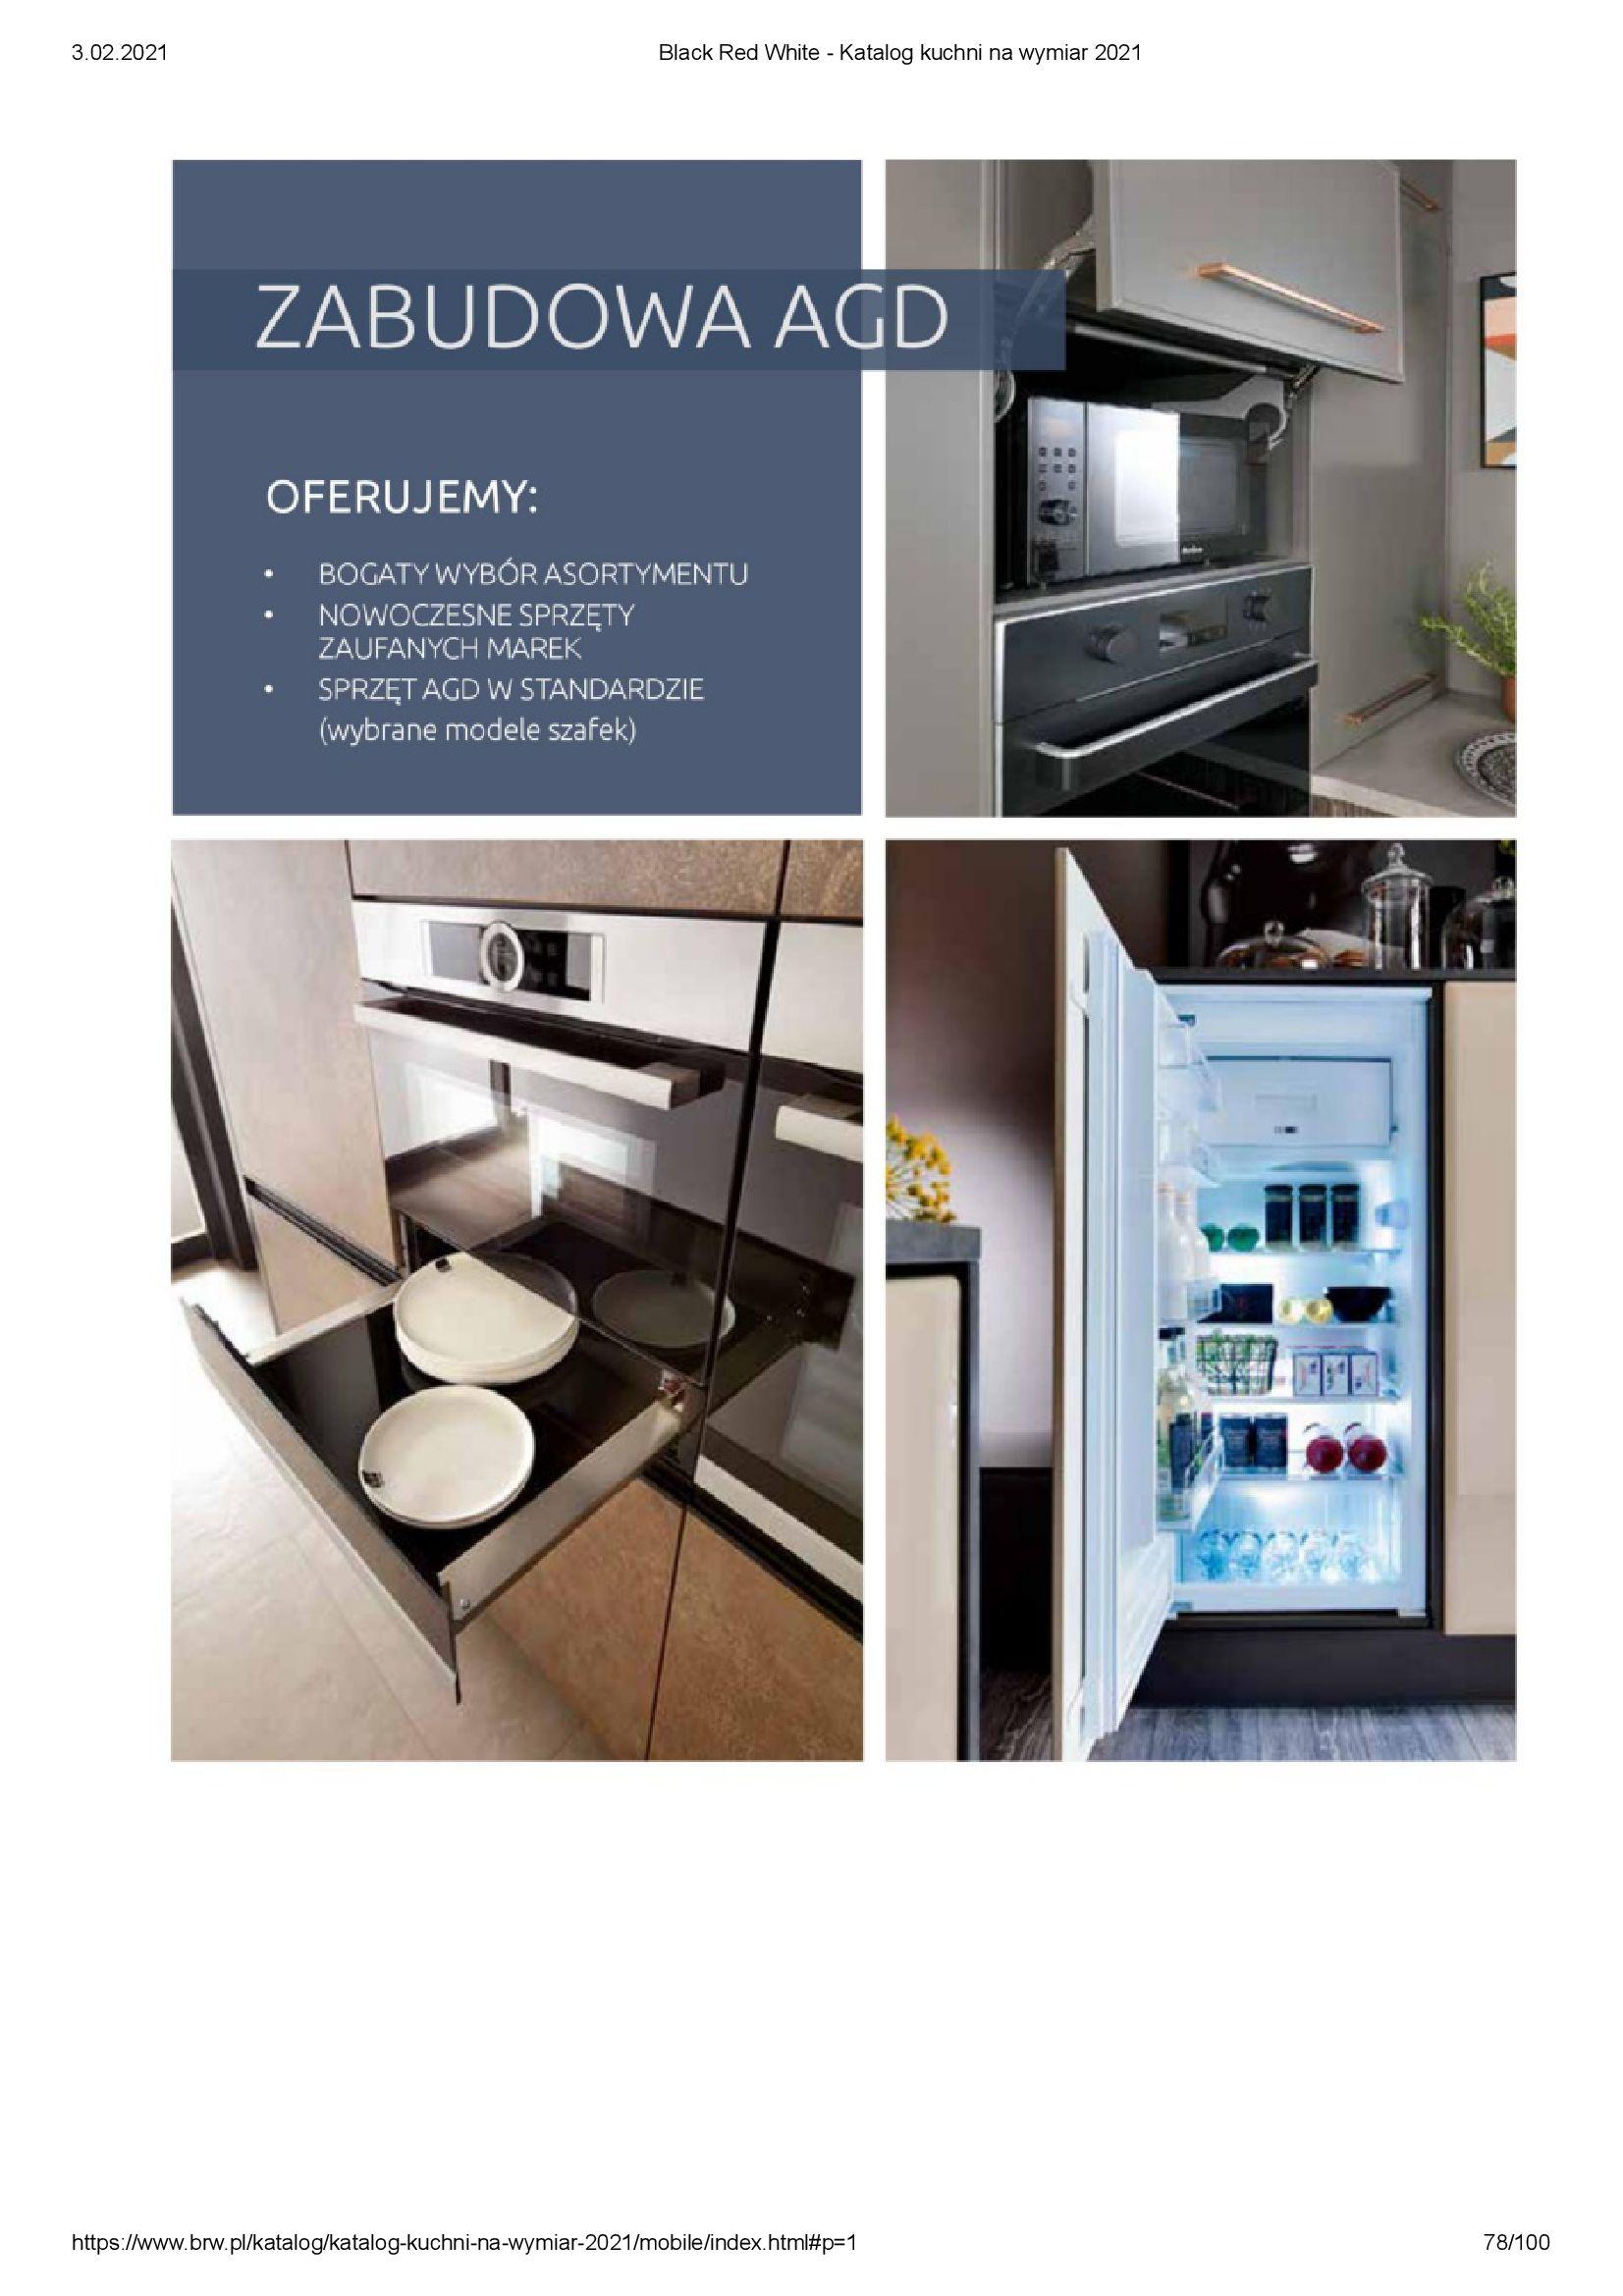 Gazetka Black Red White: Katalog - Kuchnie na wymiar Senso Kitchens 2021 2021-01-01 page-78